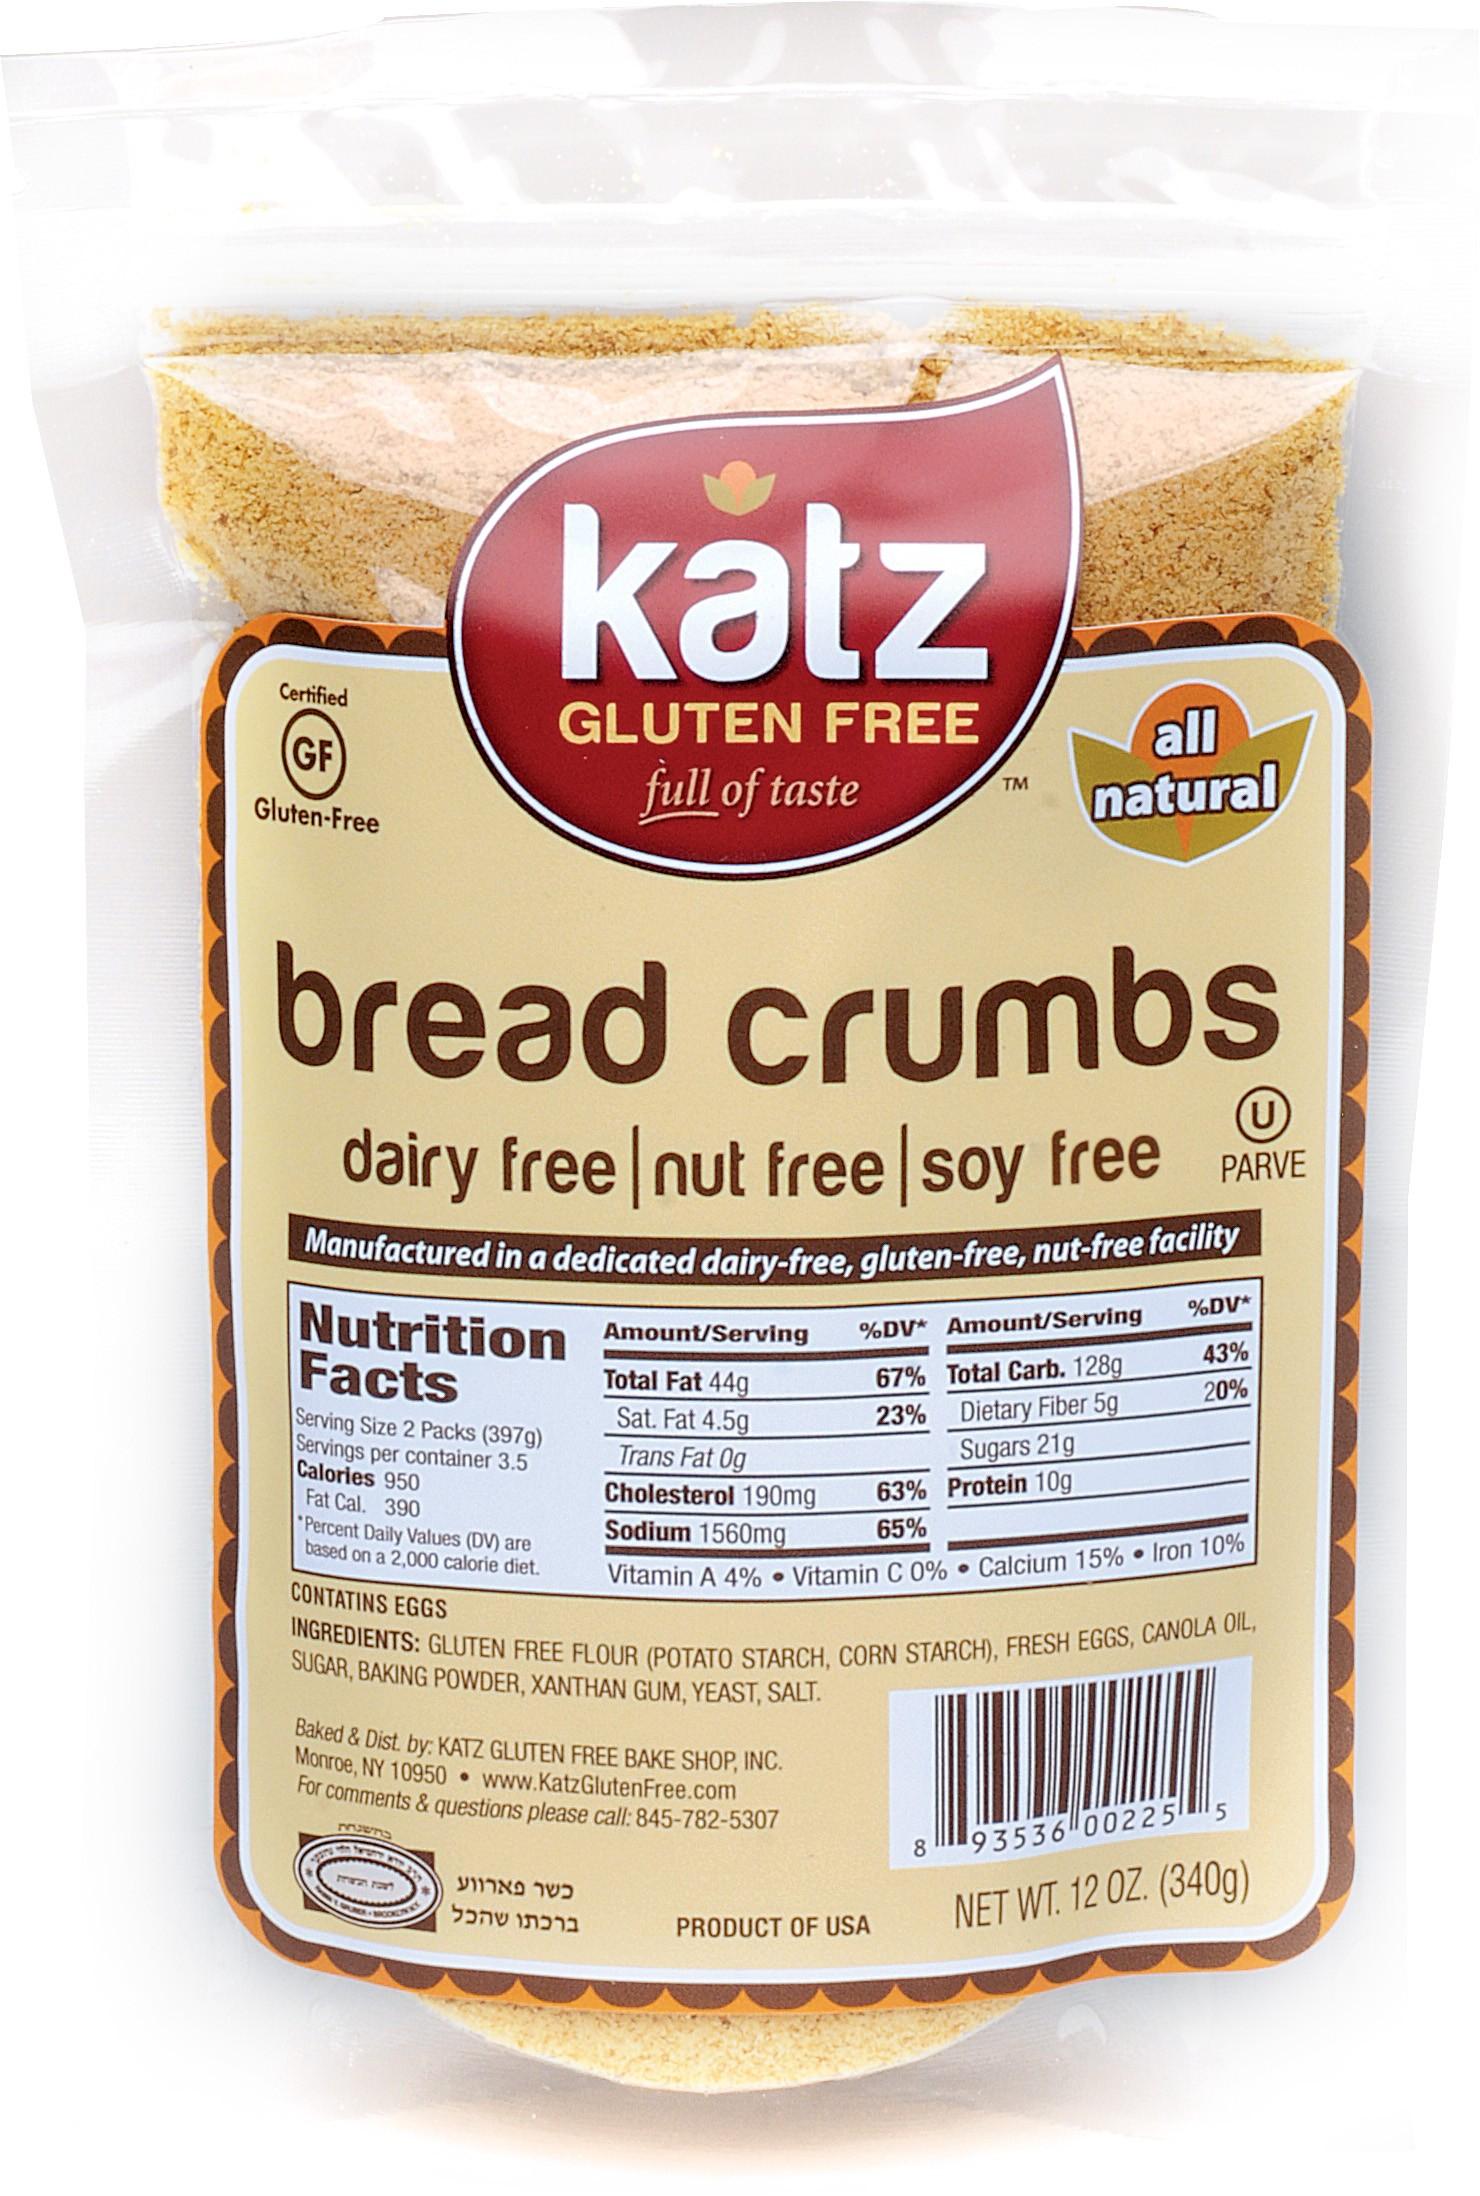 Katz Gluten Free Breadcrumbs